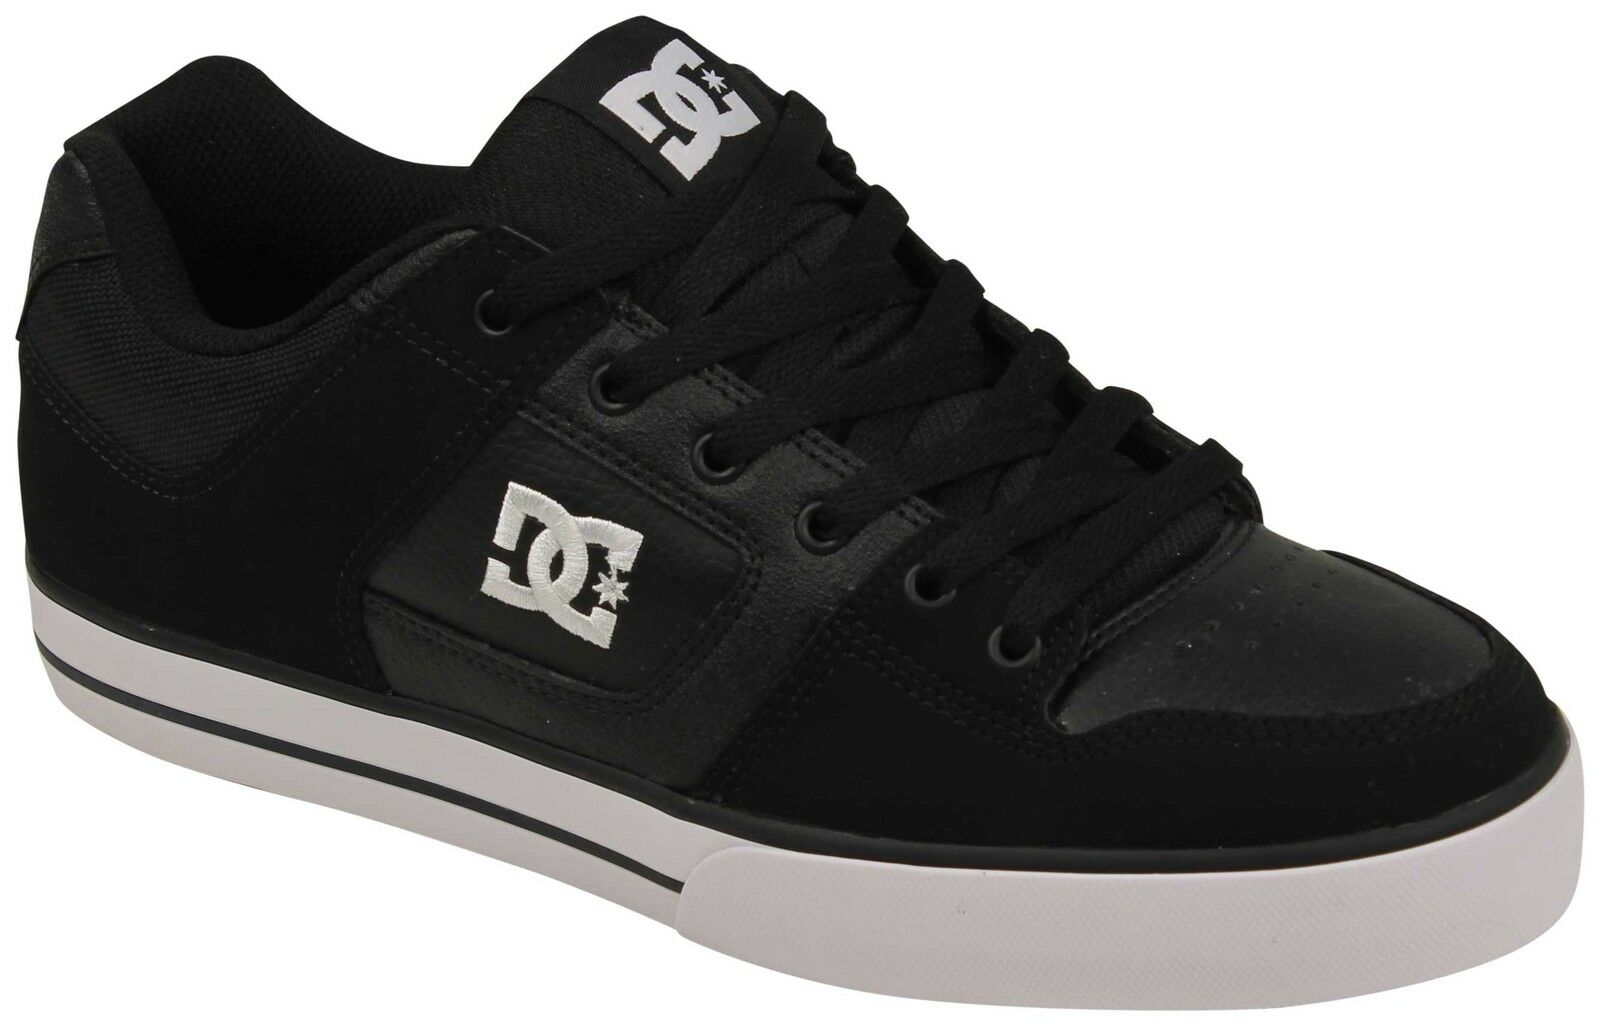 DC Pure scarpe - nero   nero   bianca - New